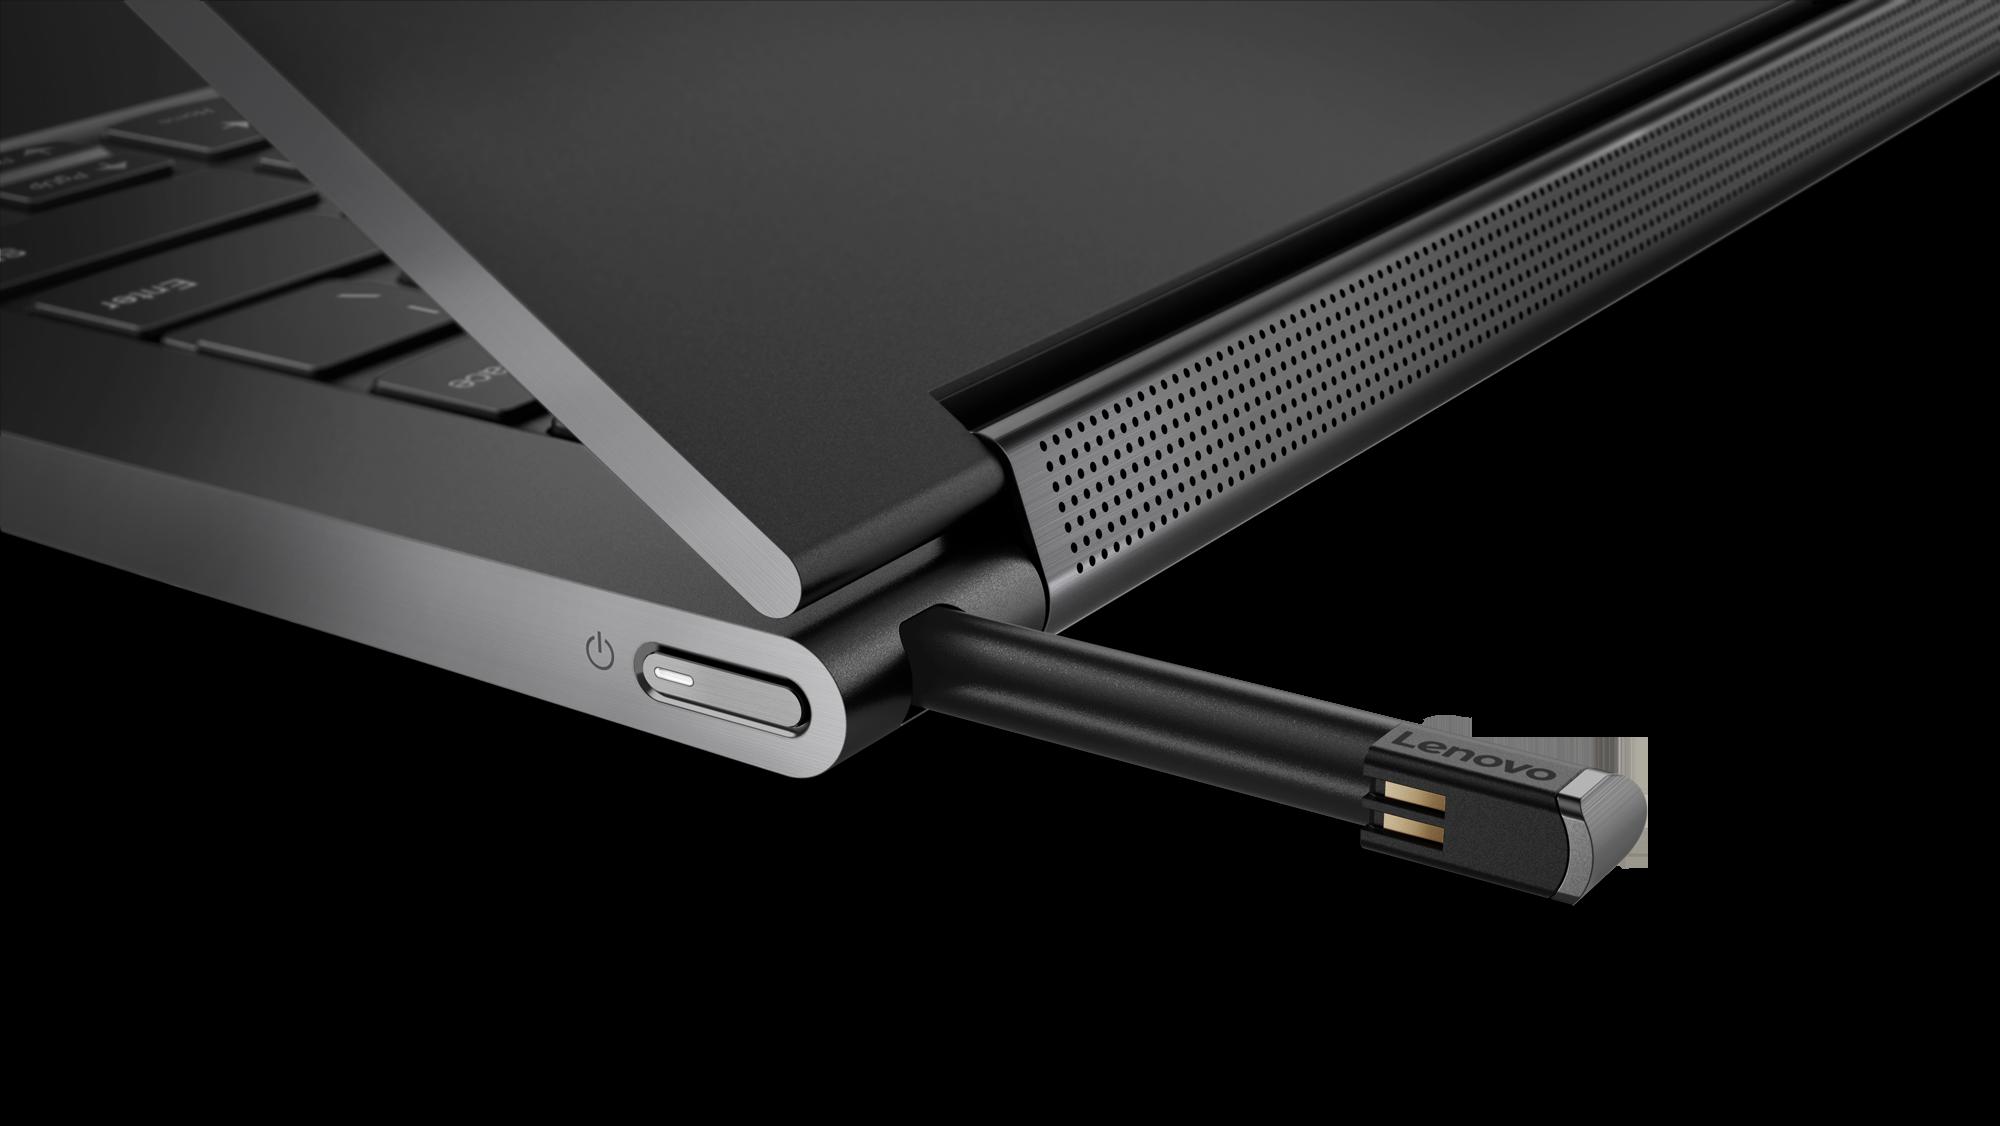 Lenovo lansează noi laptopuri și dispozitive smart la IFA 2018